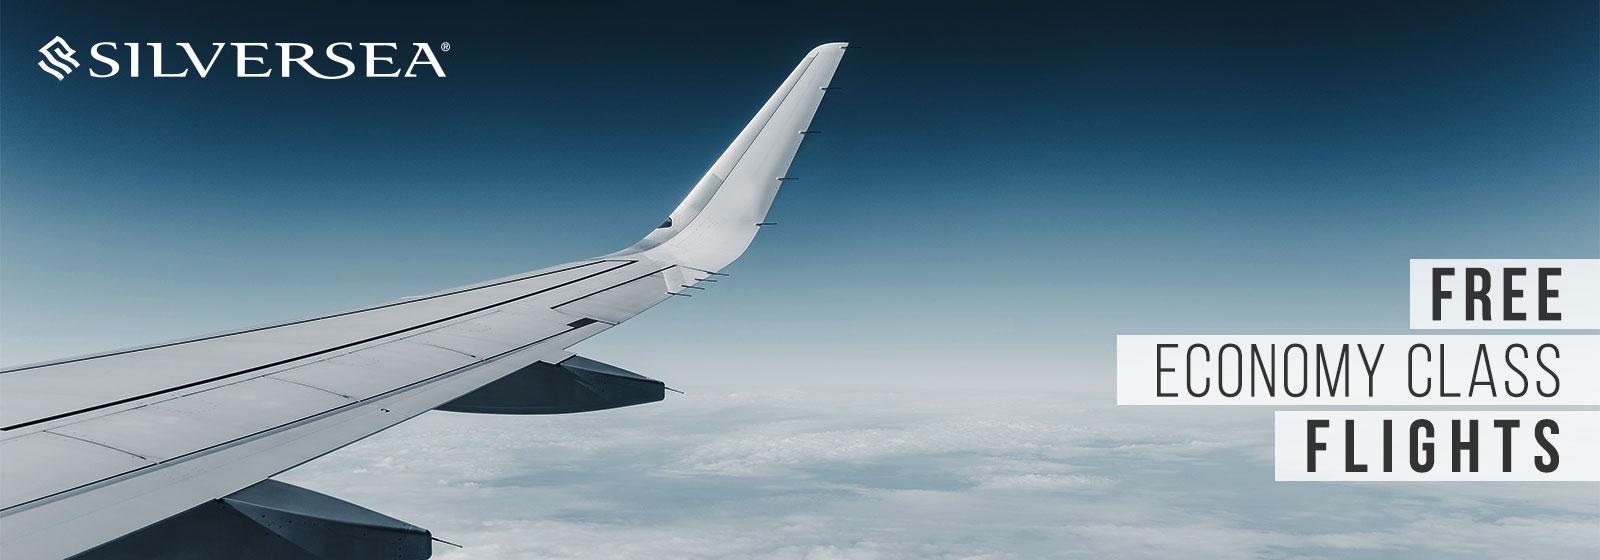 Silversea - Free Economy Class Flights